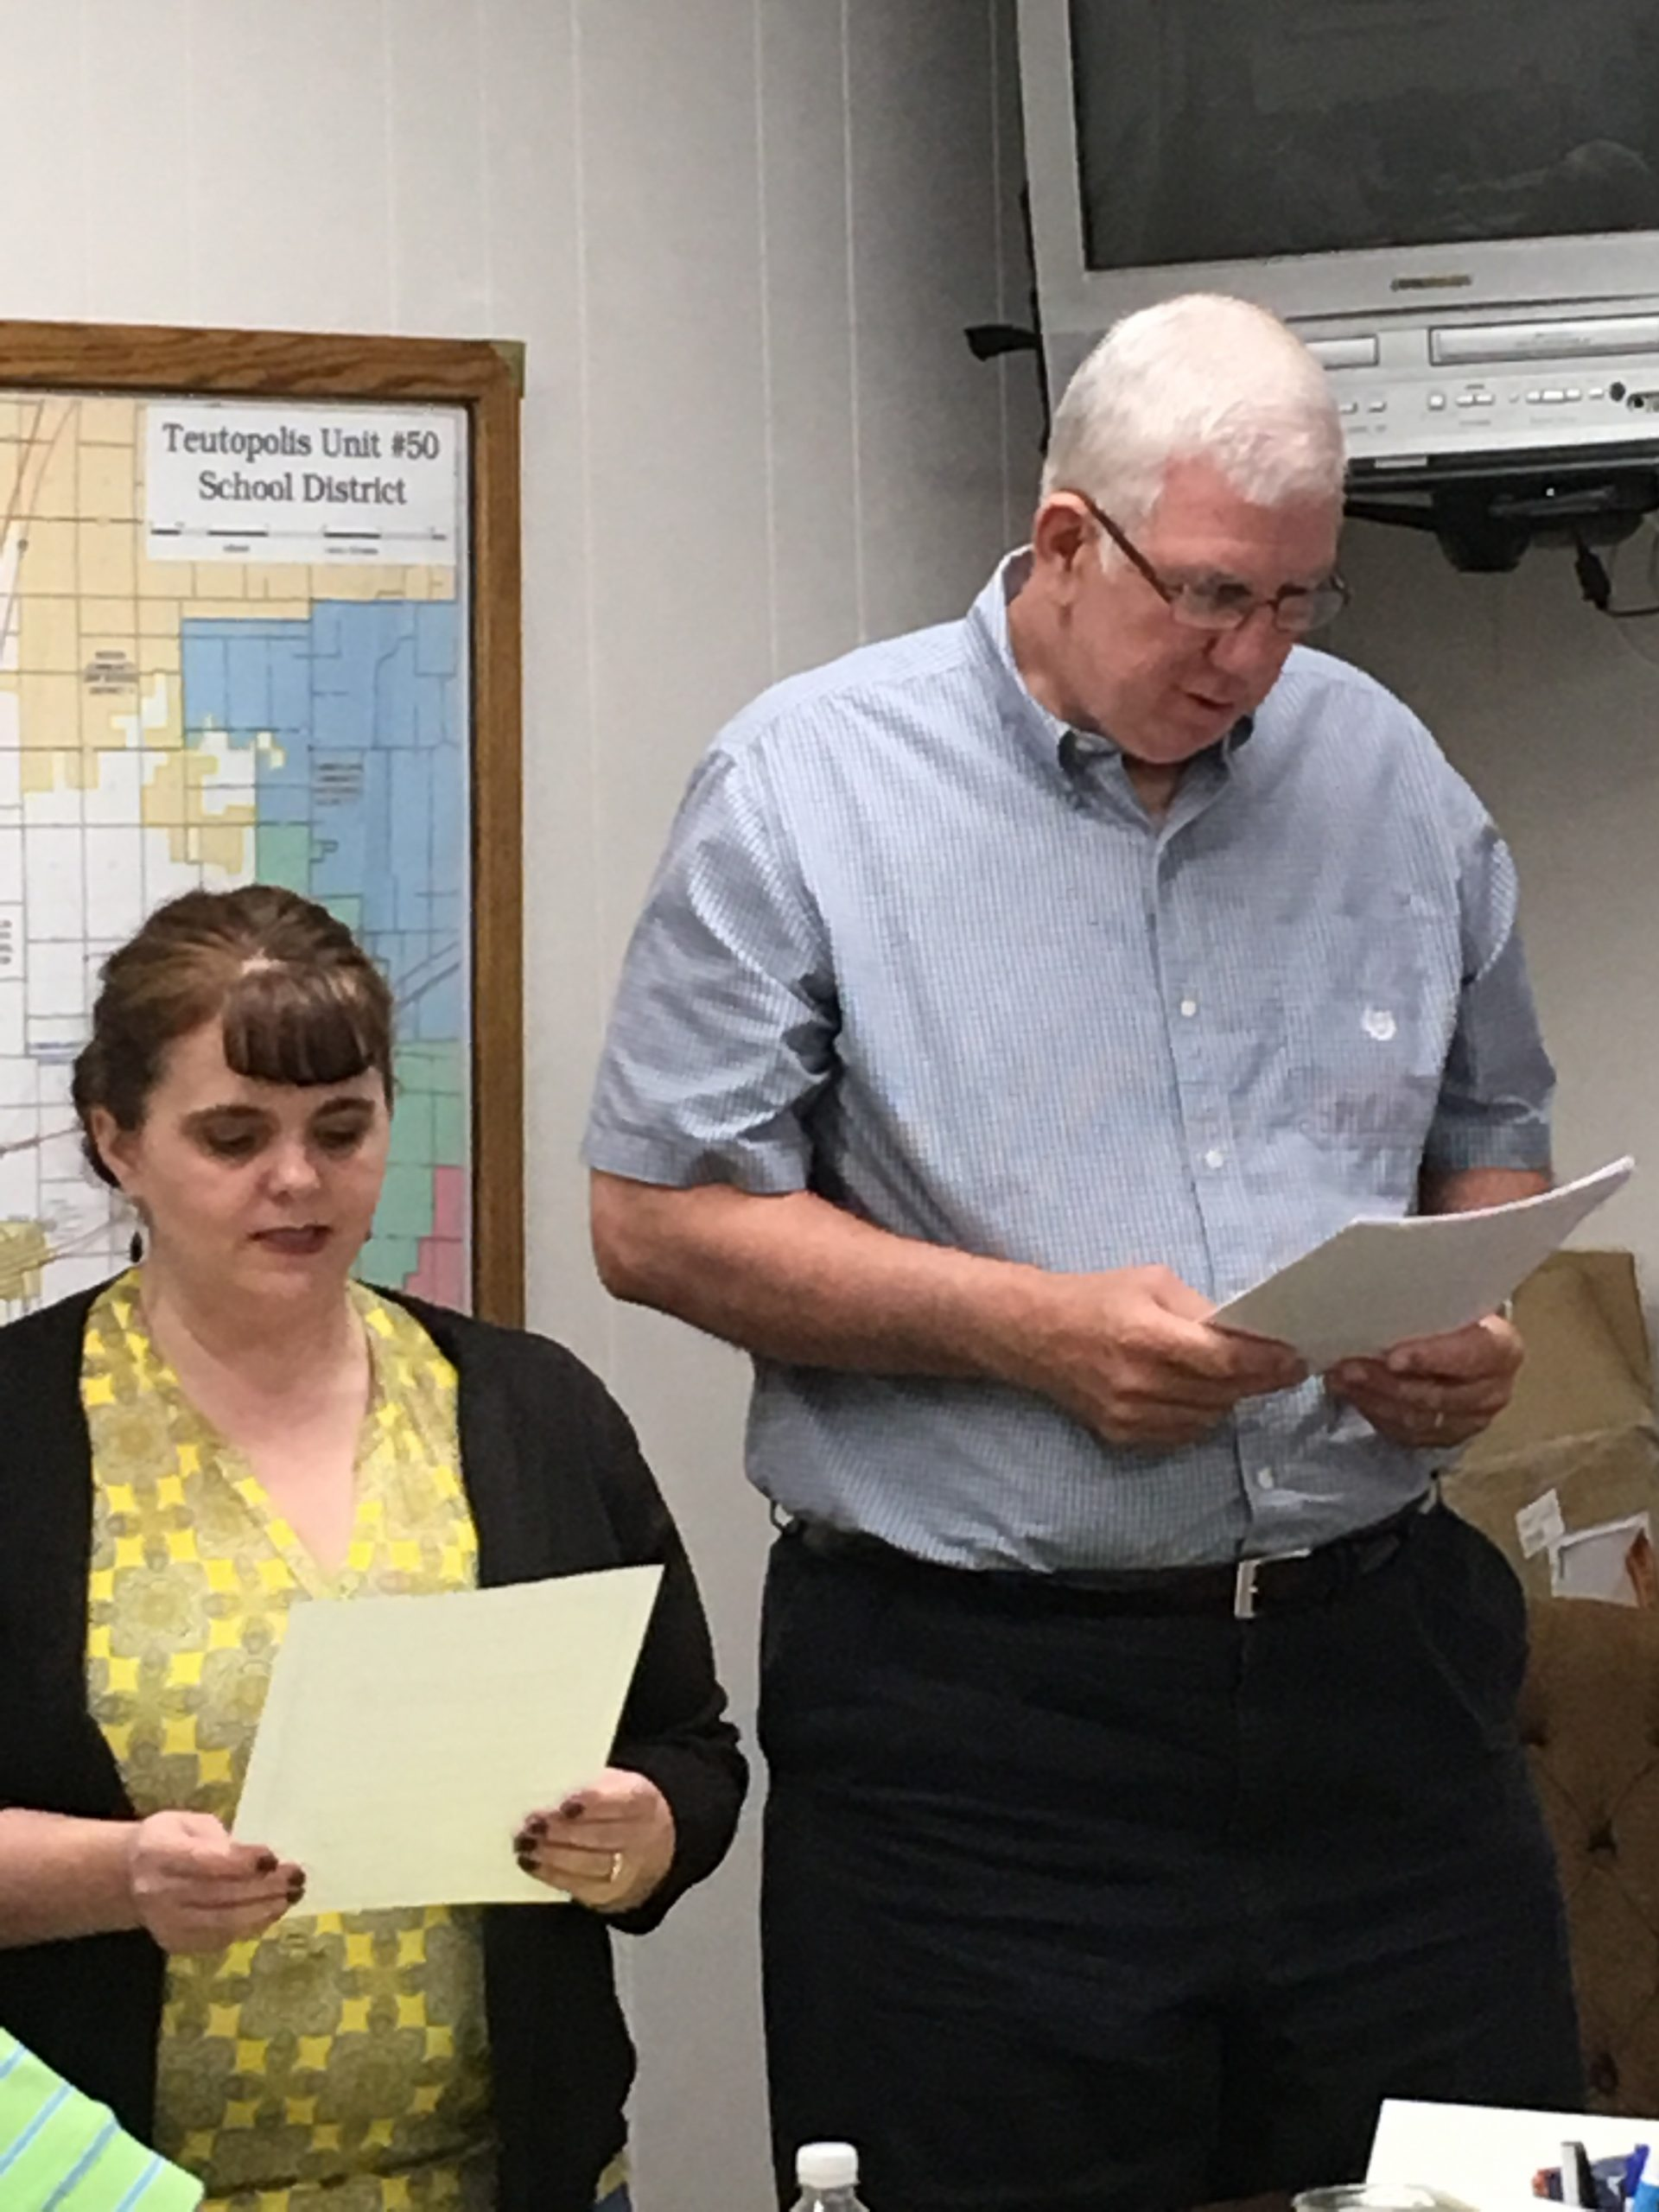 Illinois effingham county teutopolis - Teutopolis School Board Welcomes New Members